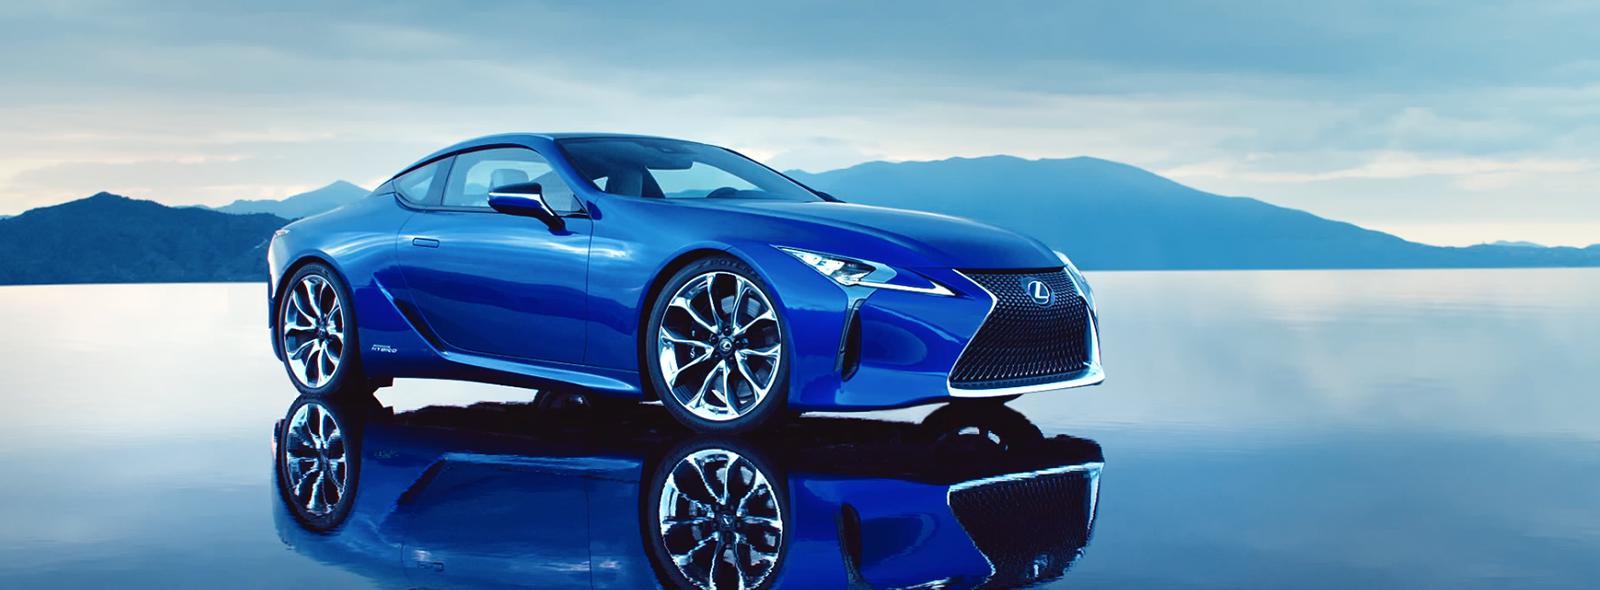 Blue Lexus LC 500h Video Cover